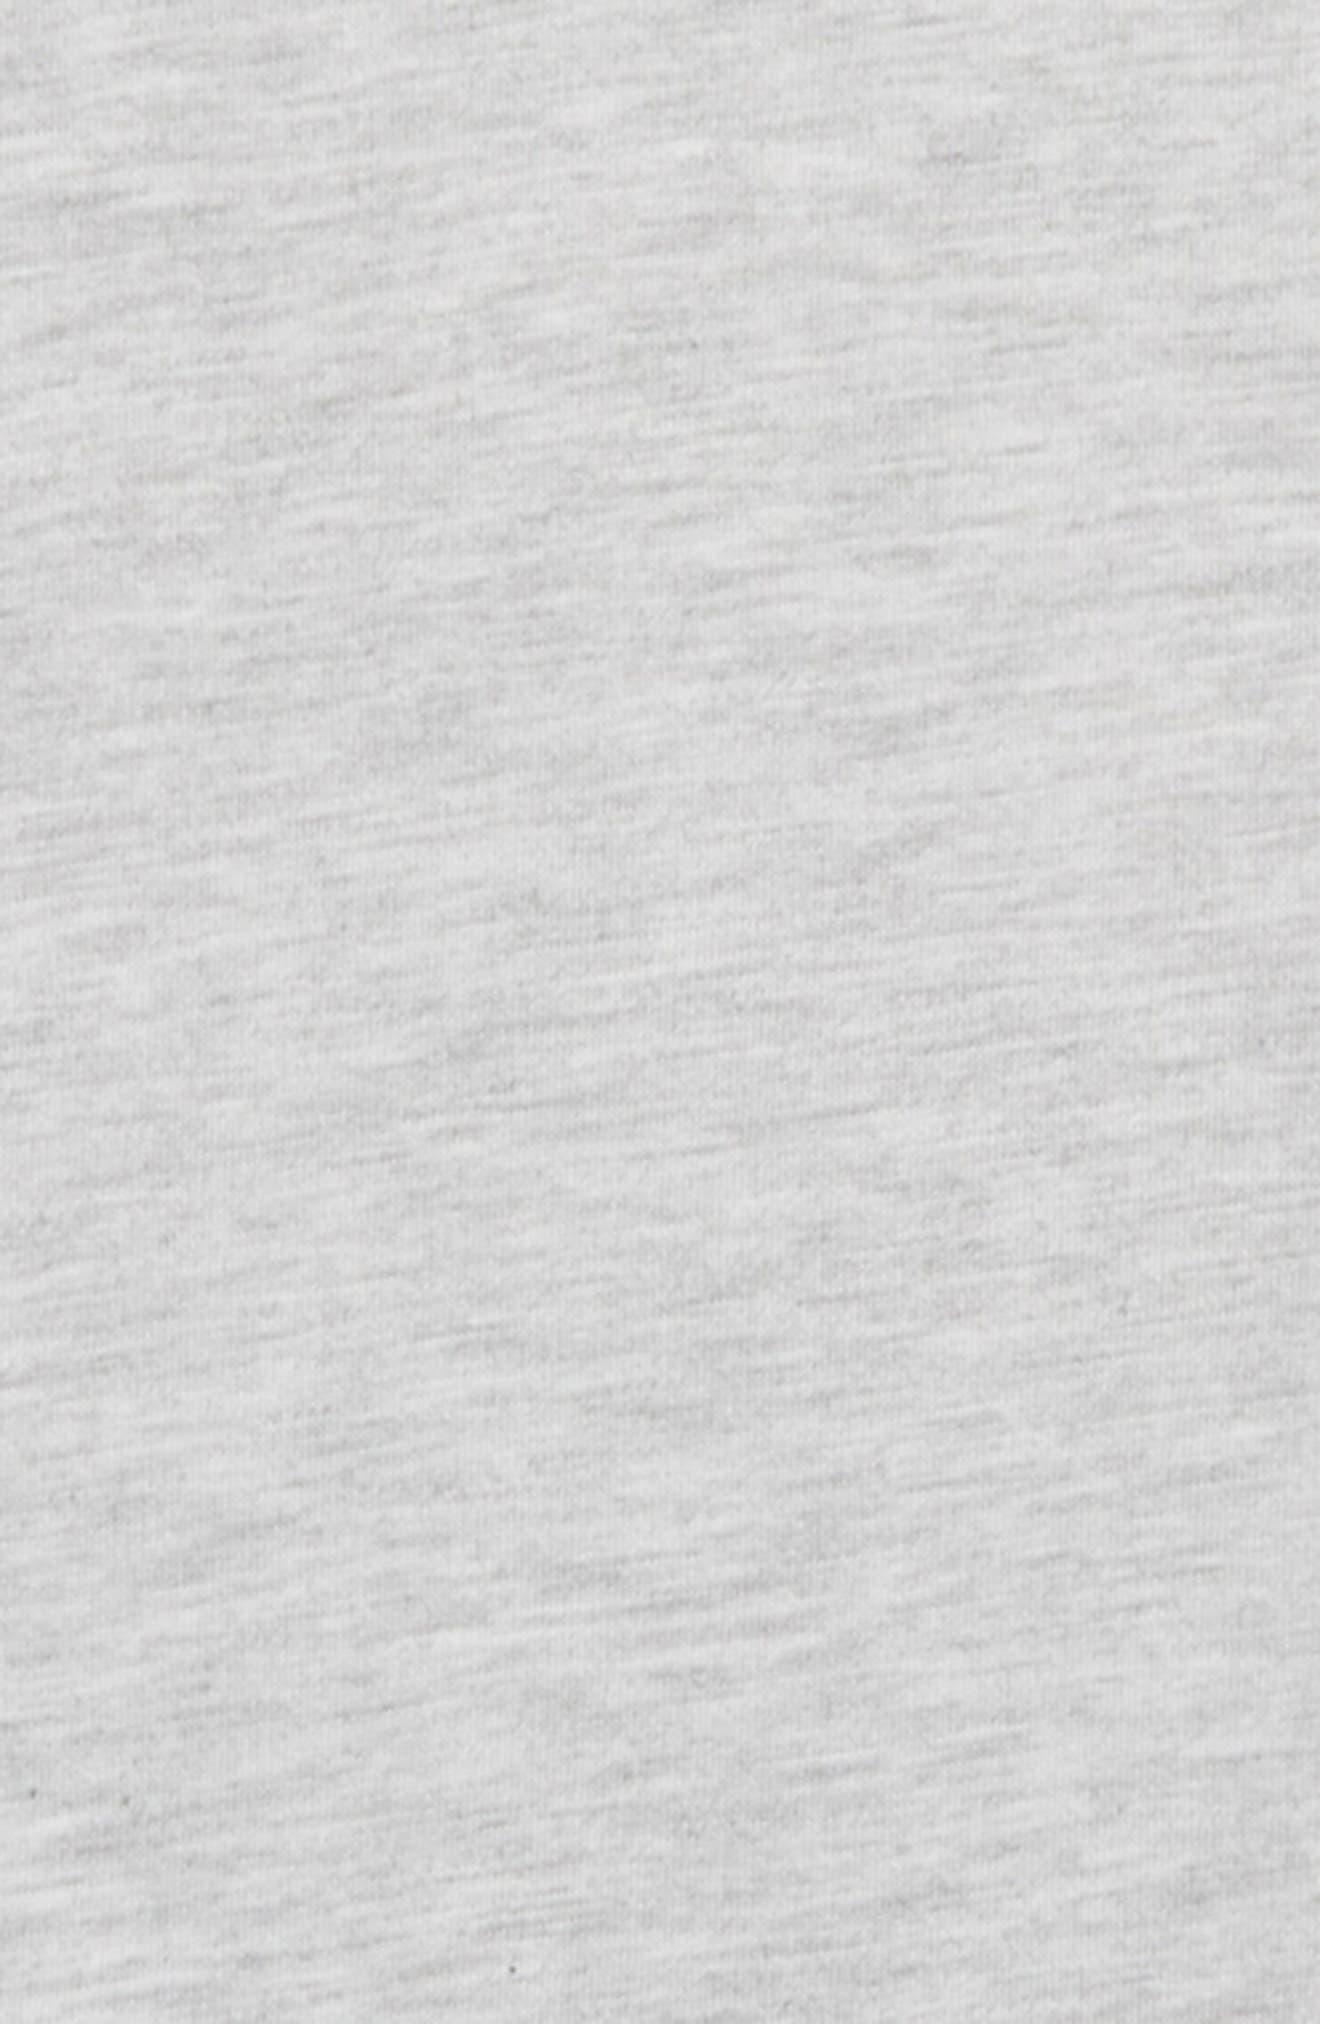 Tucker & Tate Long Sleeve Sleep T-Shirt,                             Alternate thumbnail 2, color,                             GREY ASH HEATHER